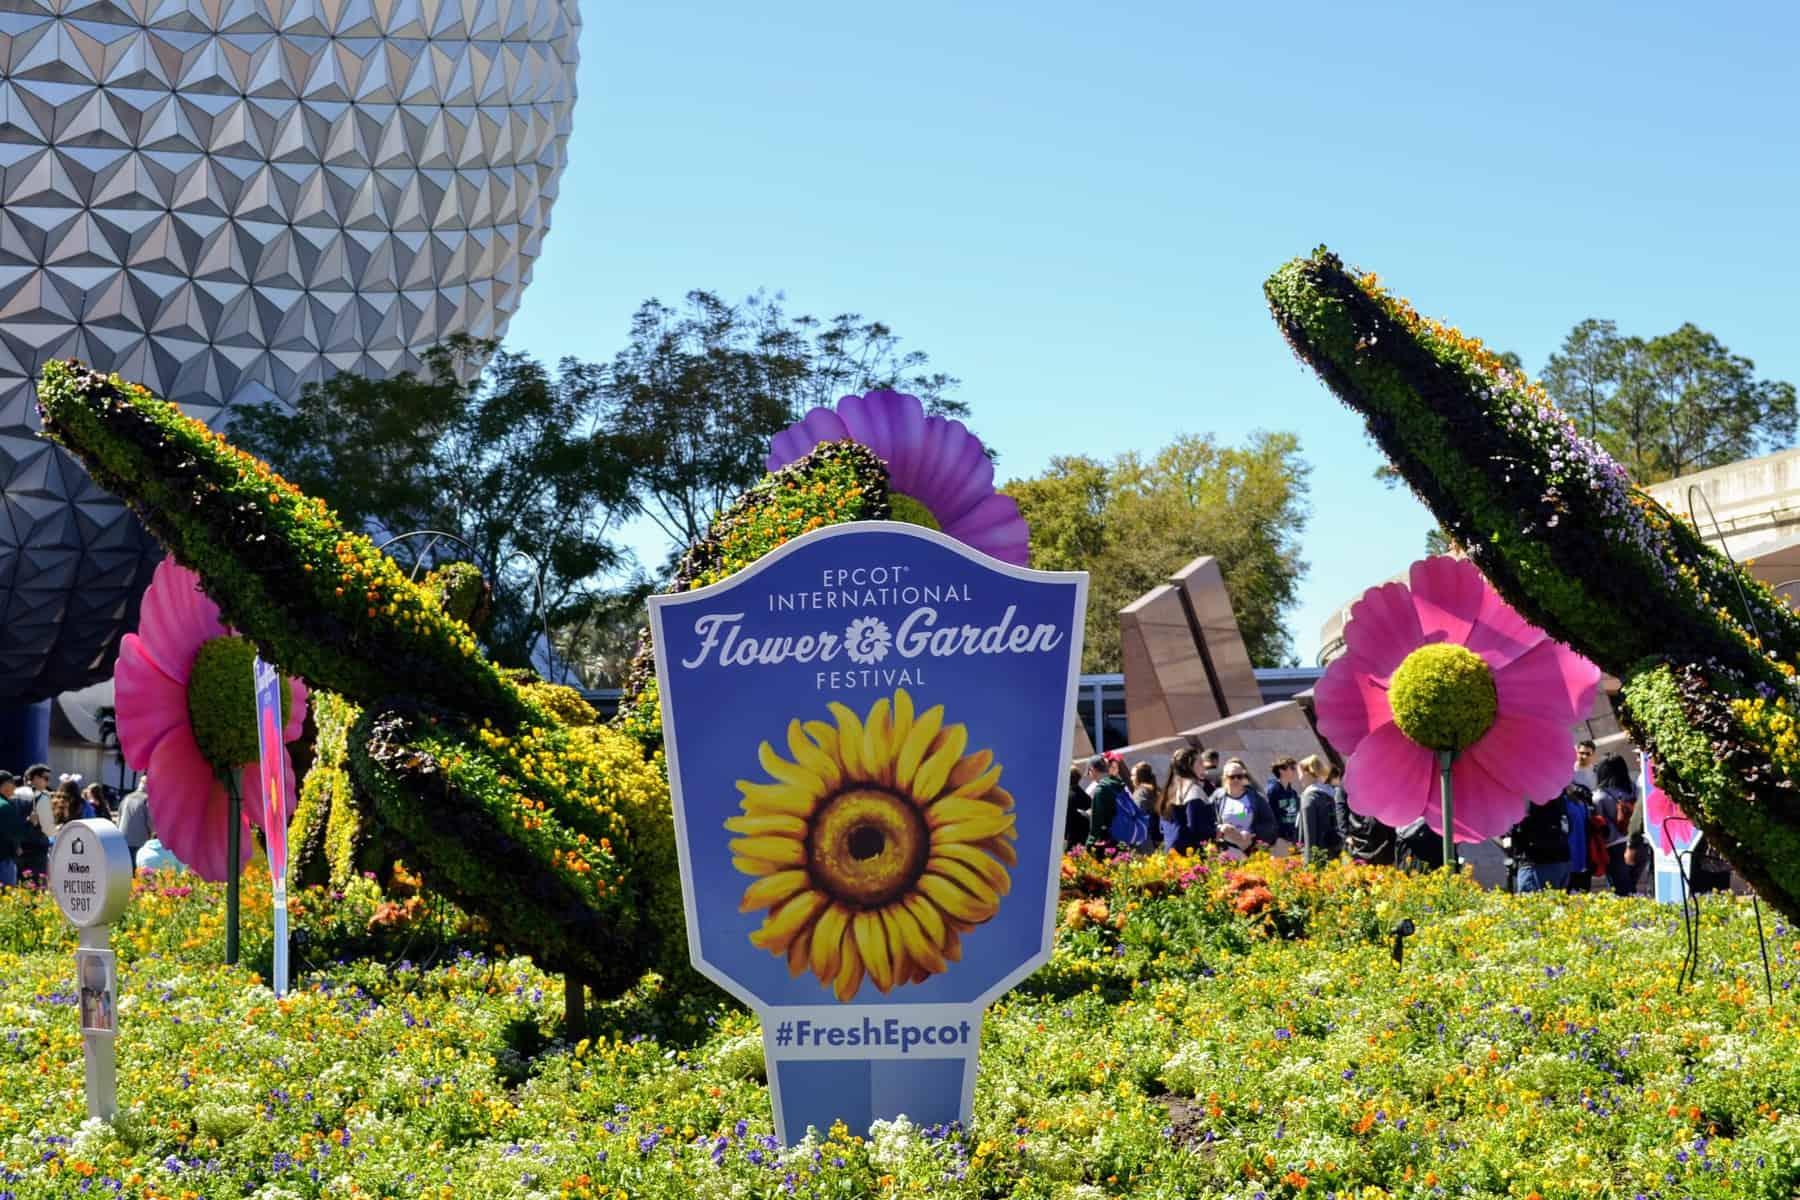 Epcot's Flower & Garden Festival entrance